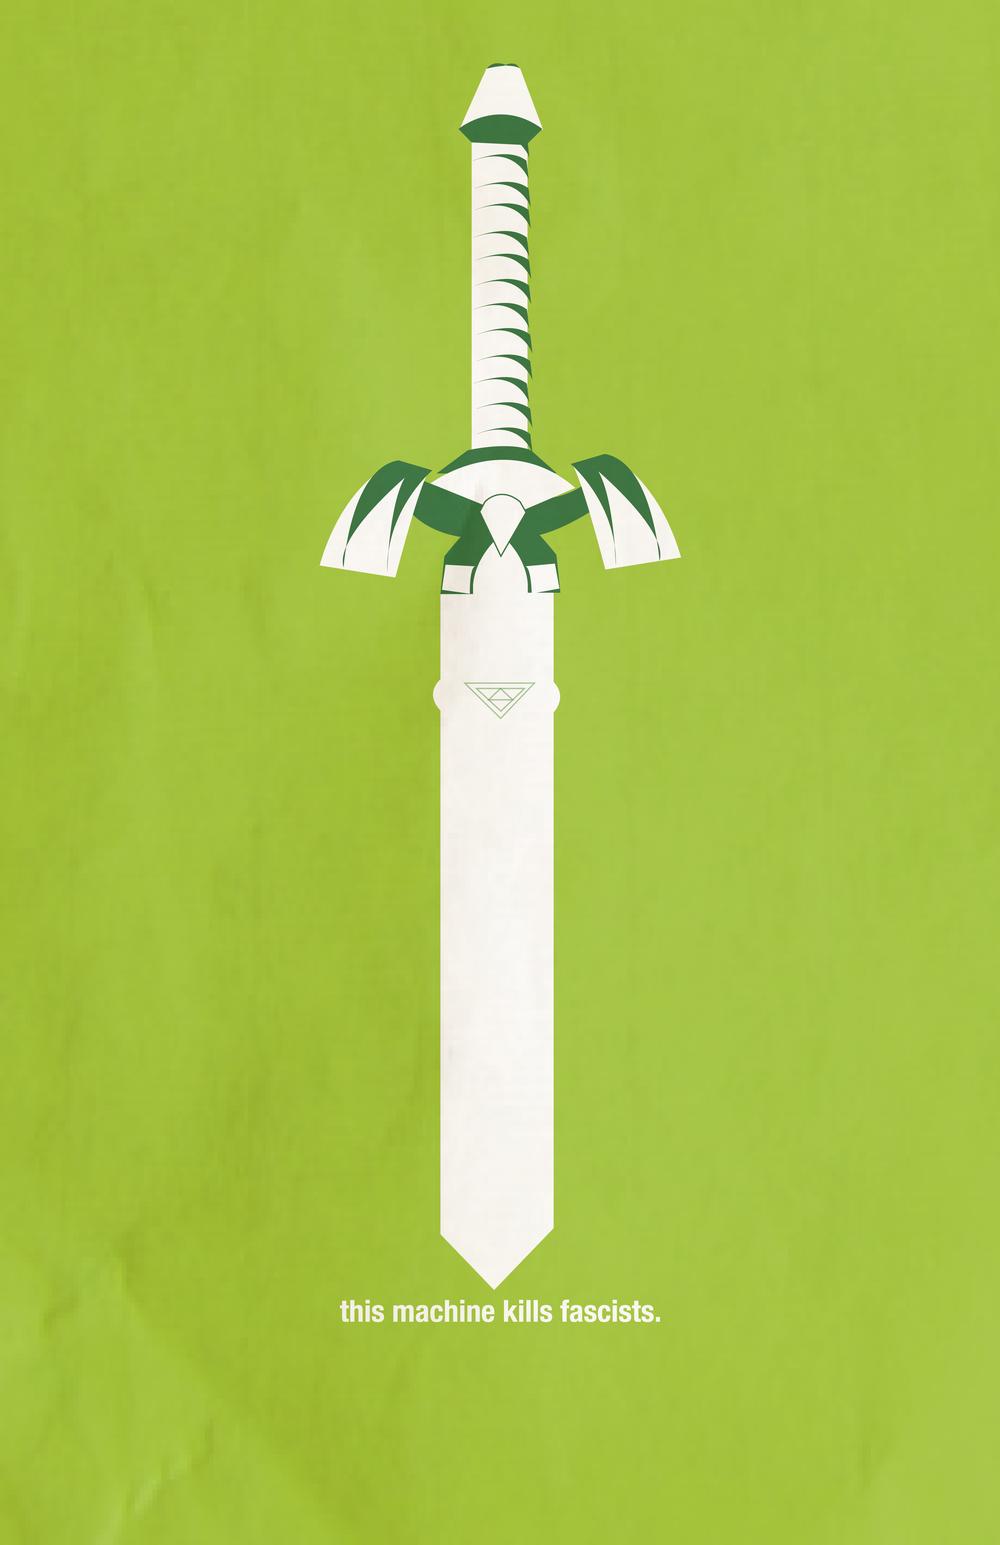 This Machine KillsFascists: Master Sword